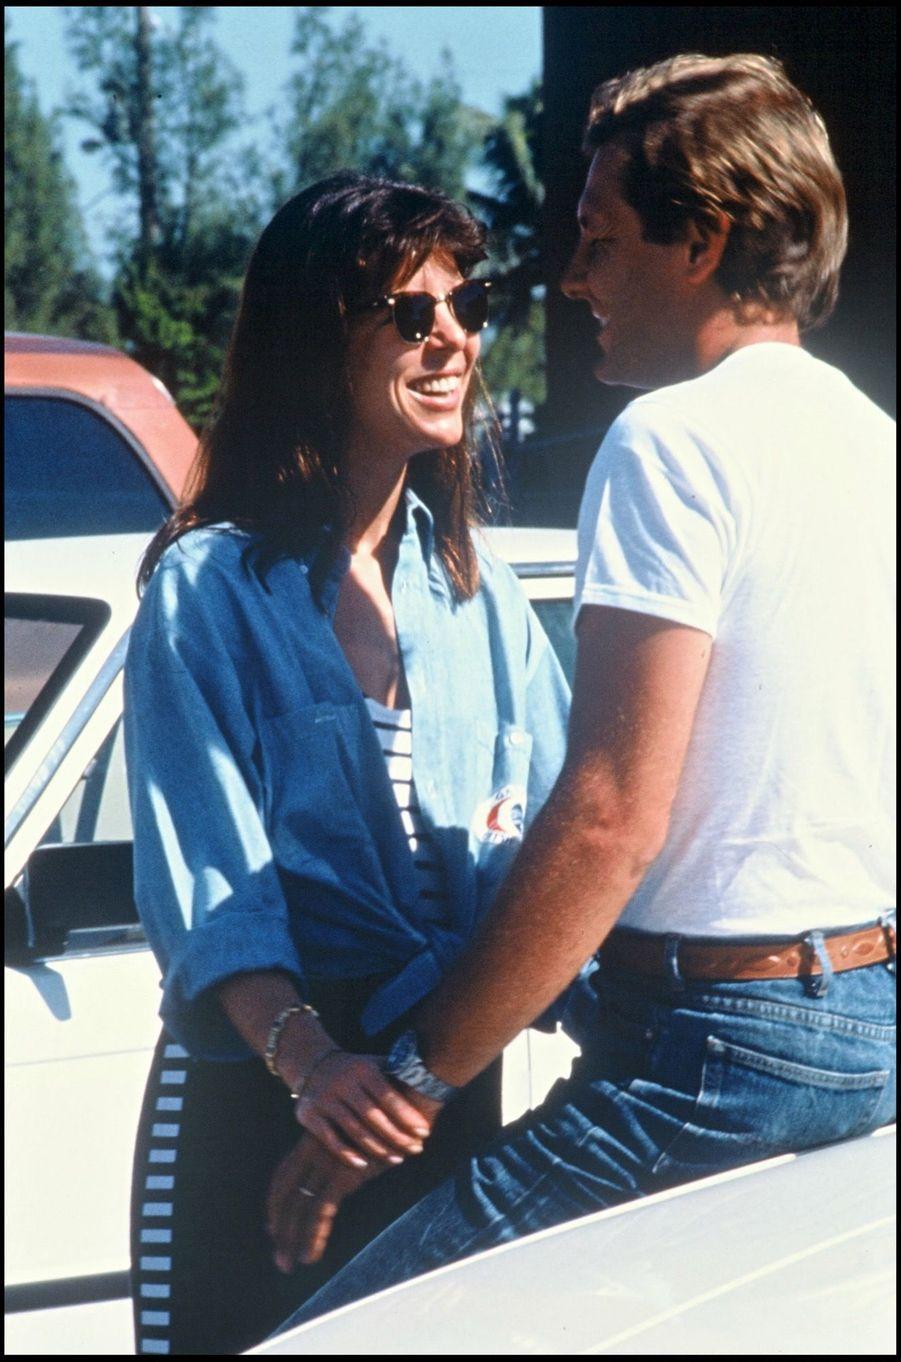 Caroline de Monaco et Stefano Casiraghi, 14 novembre 1988.